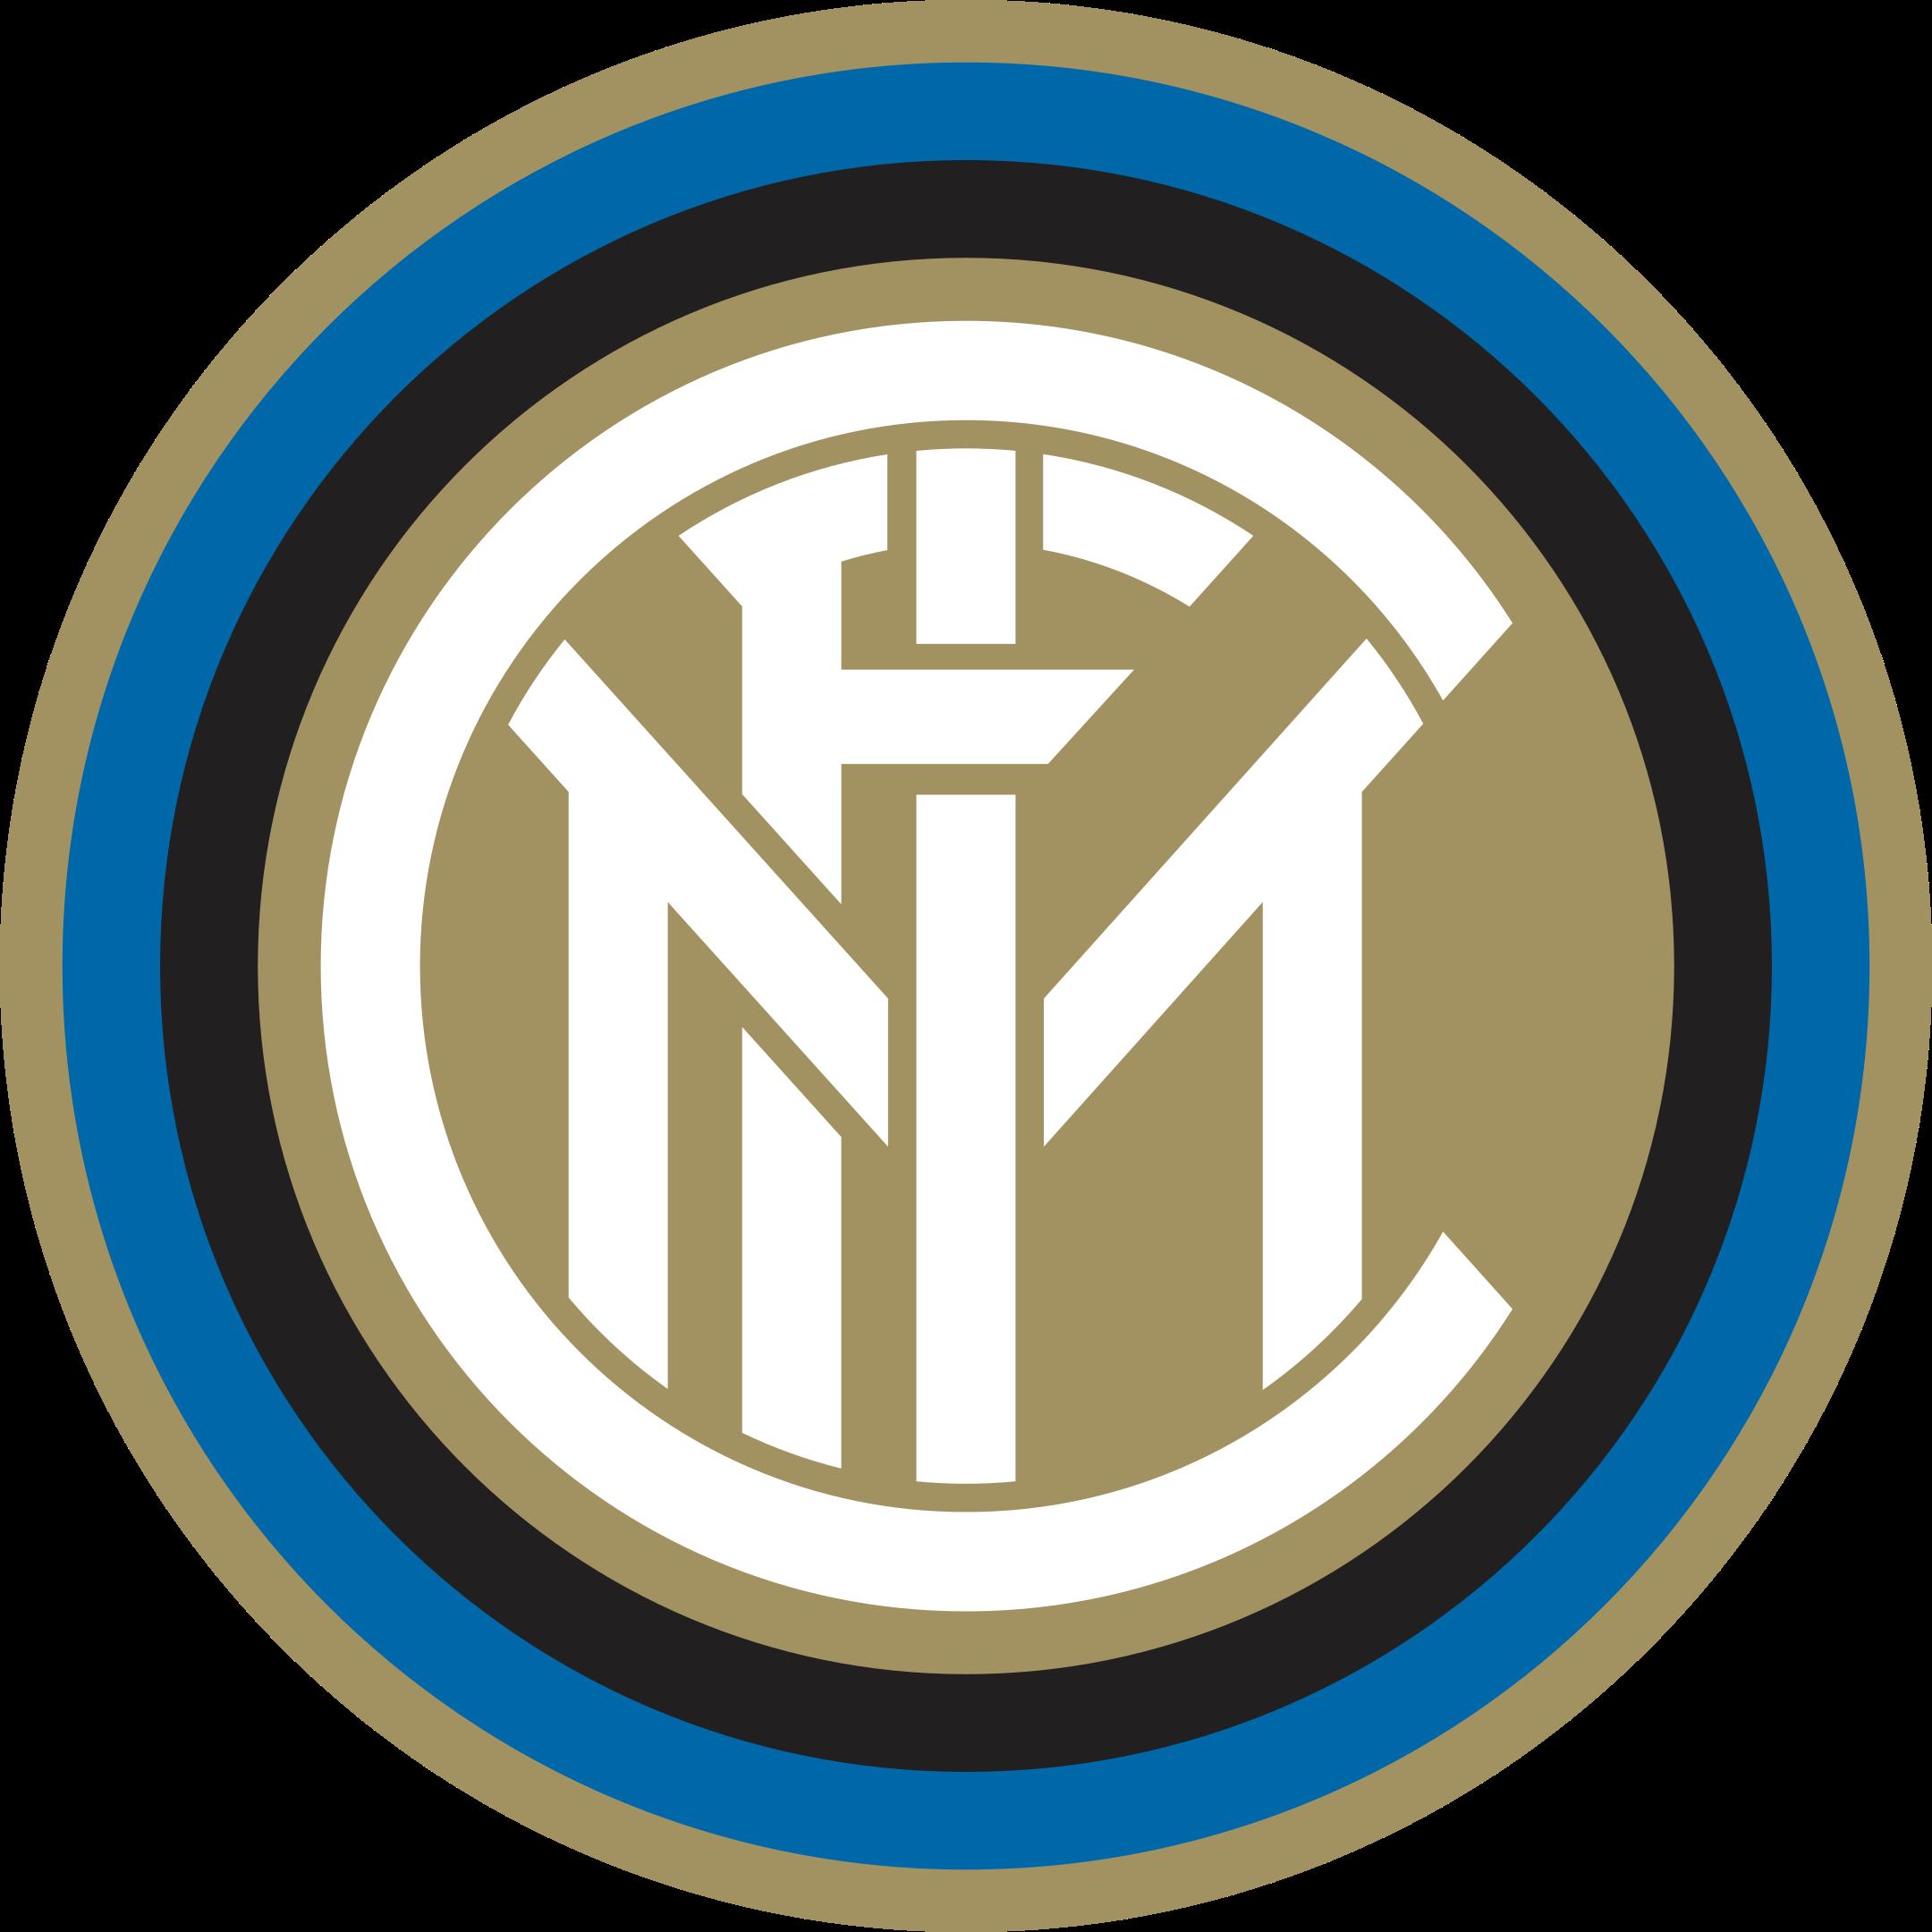 internazionale inter logo 1 - Inter Milan - Internazionale Logo